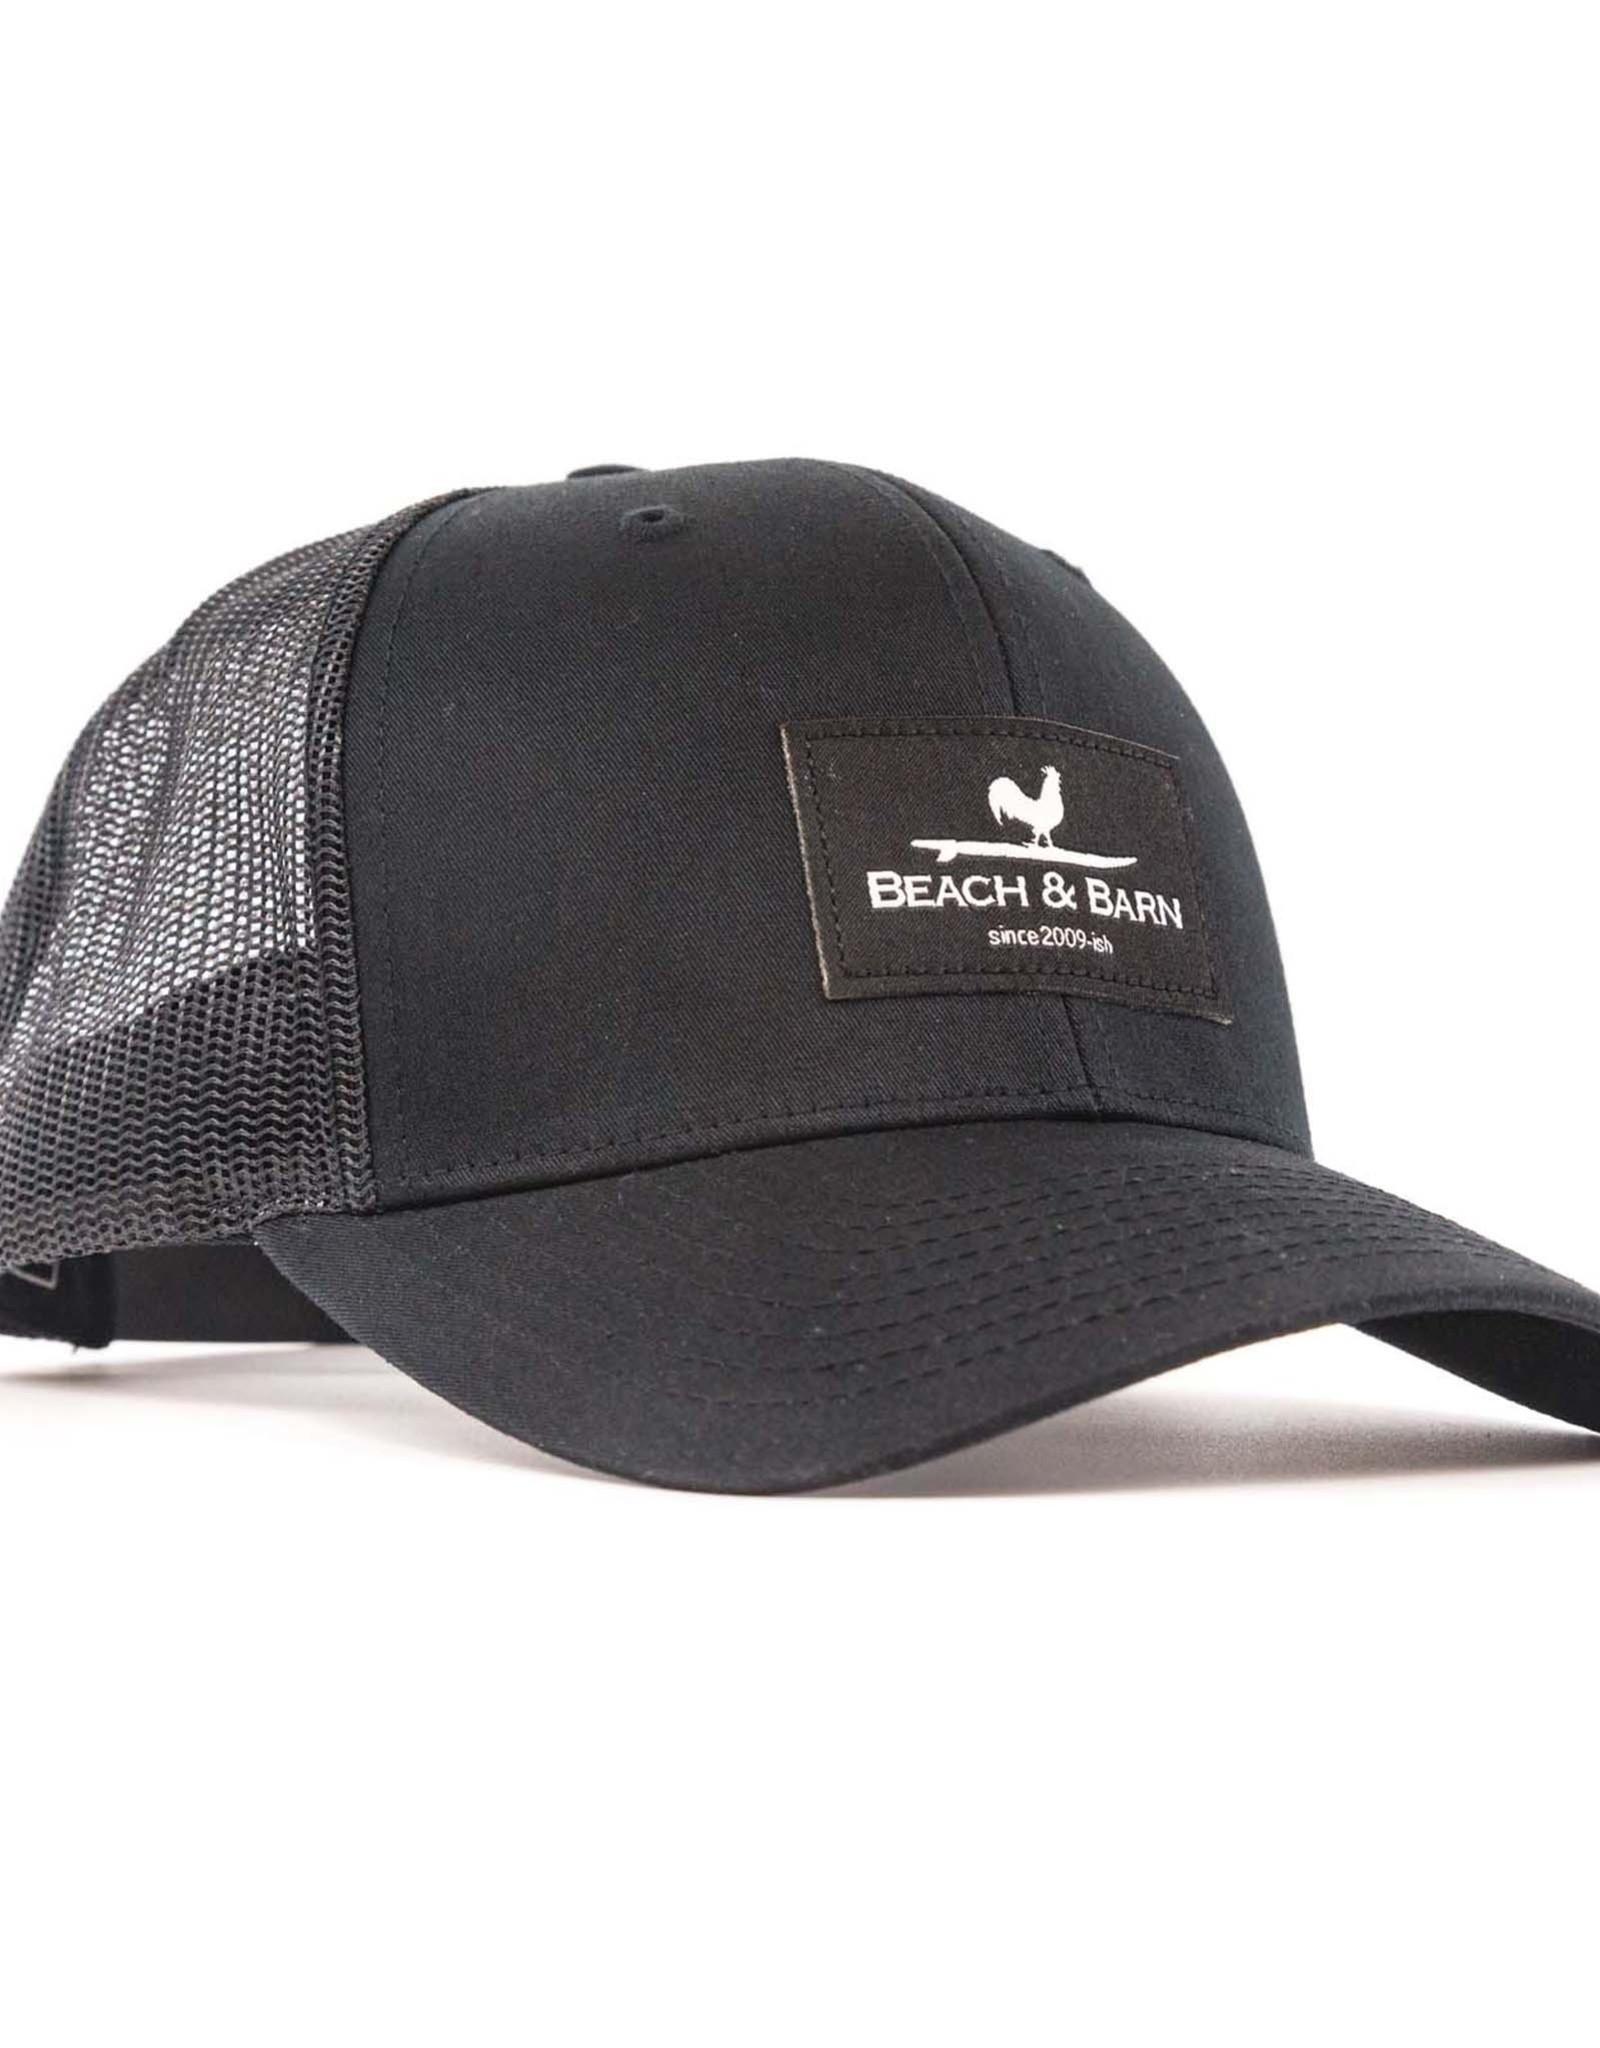 Beach &  Barn Woven Label Snap Back Hat